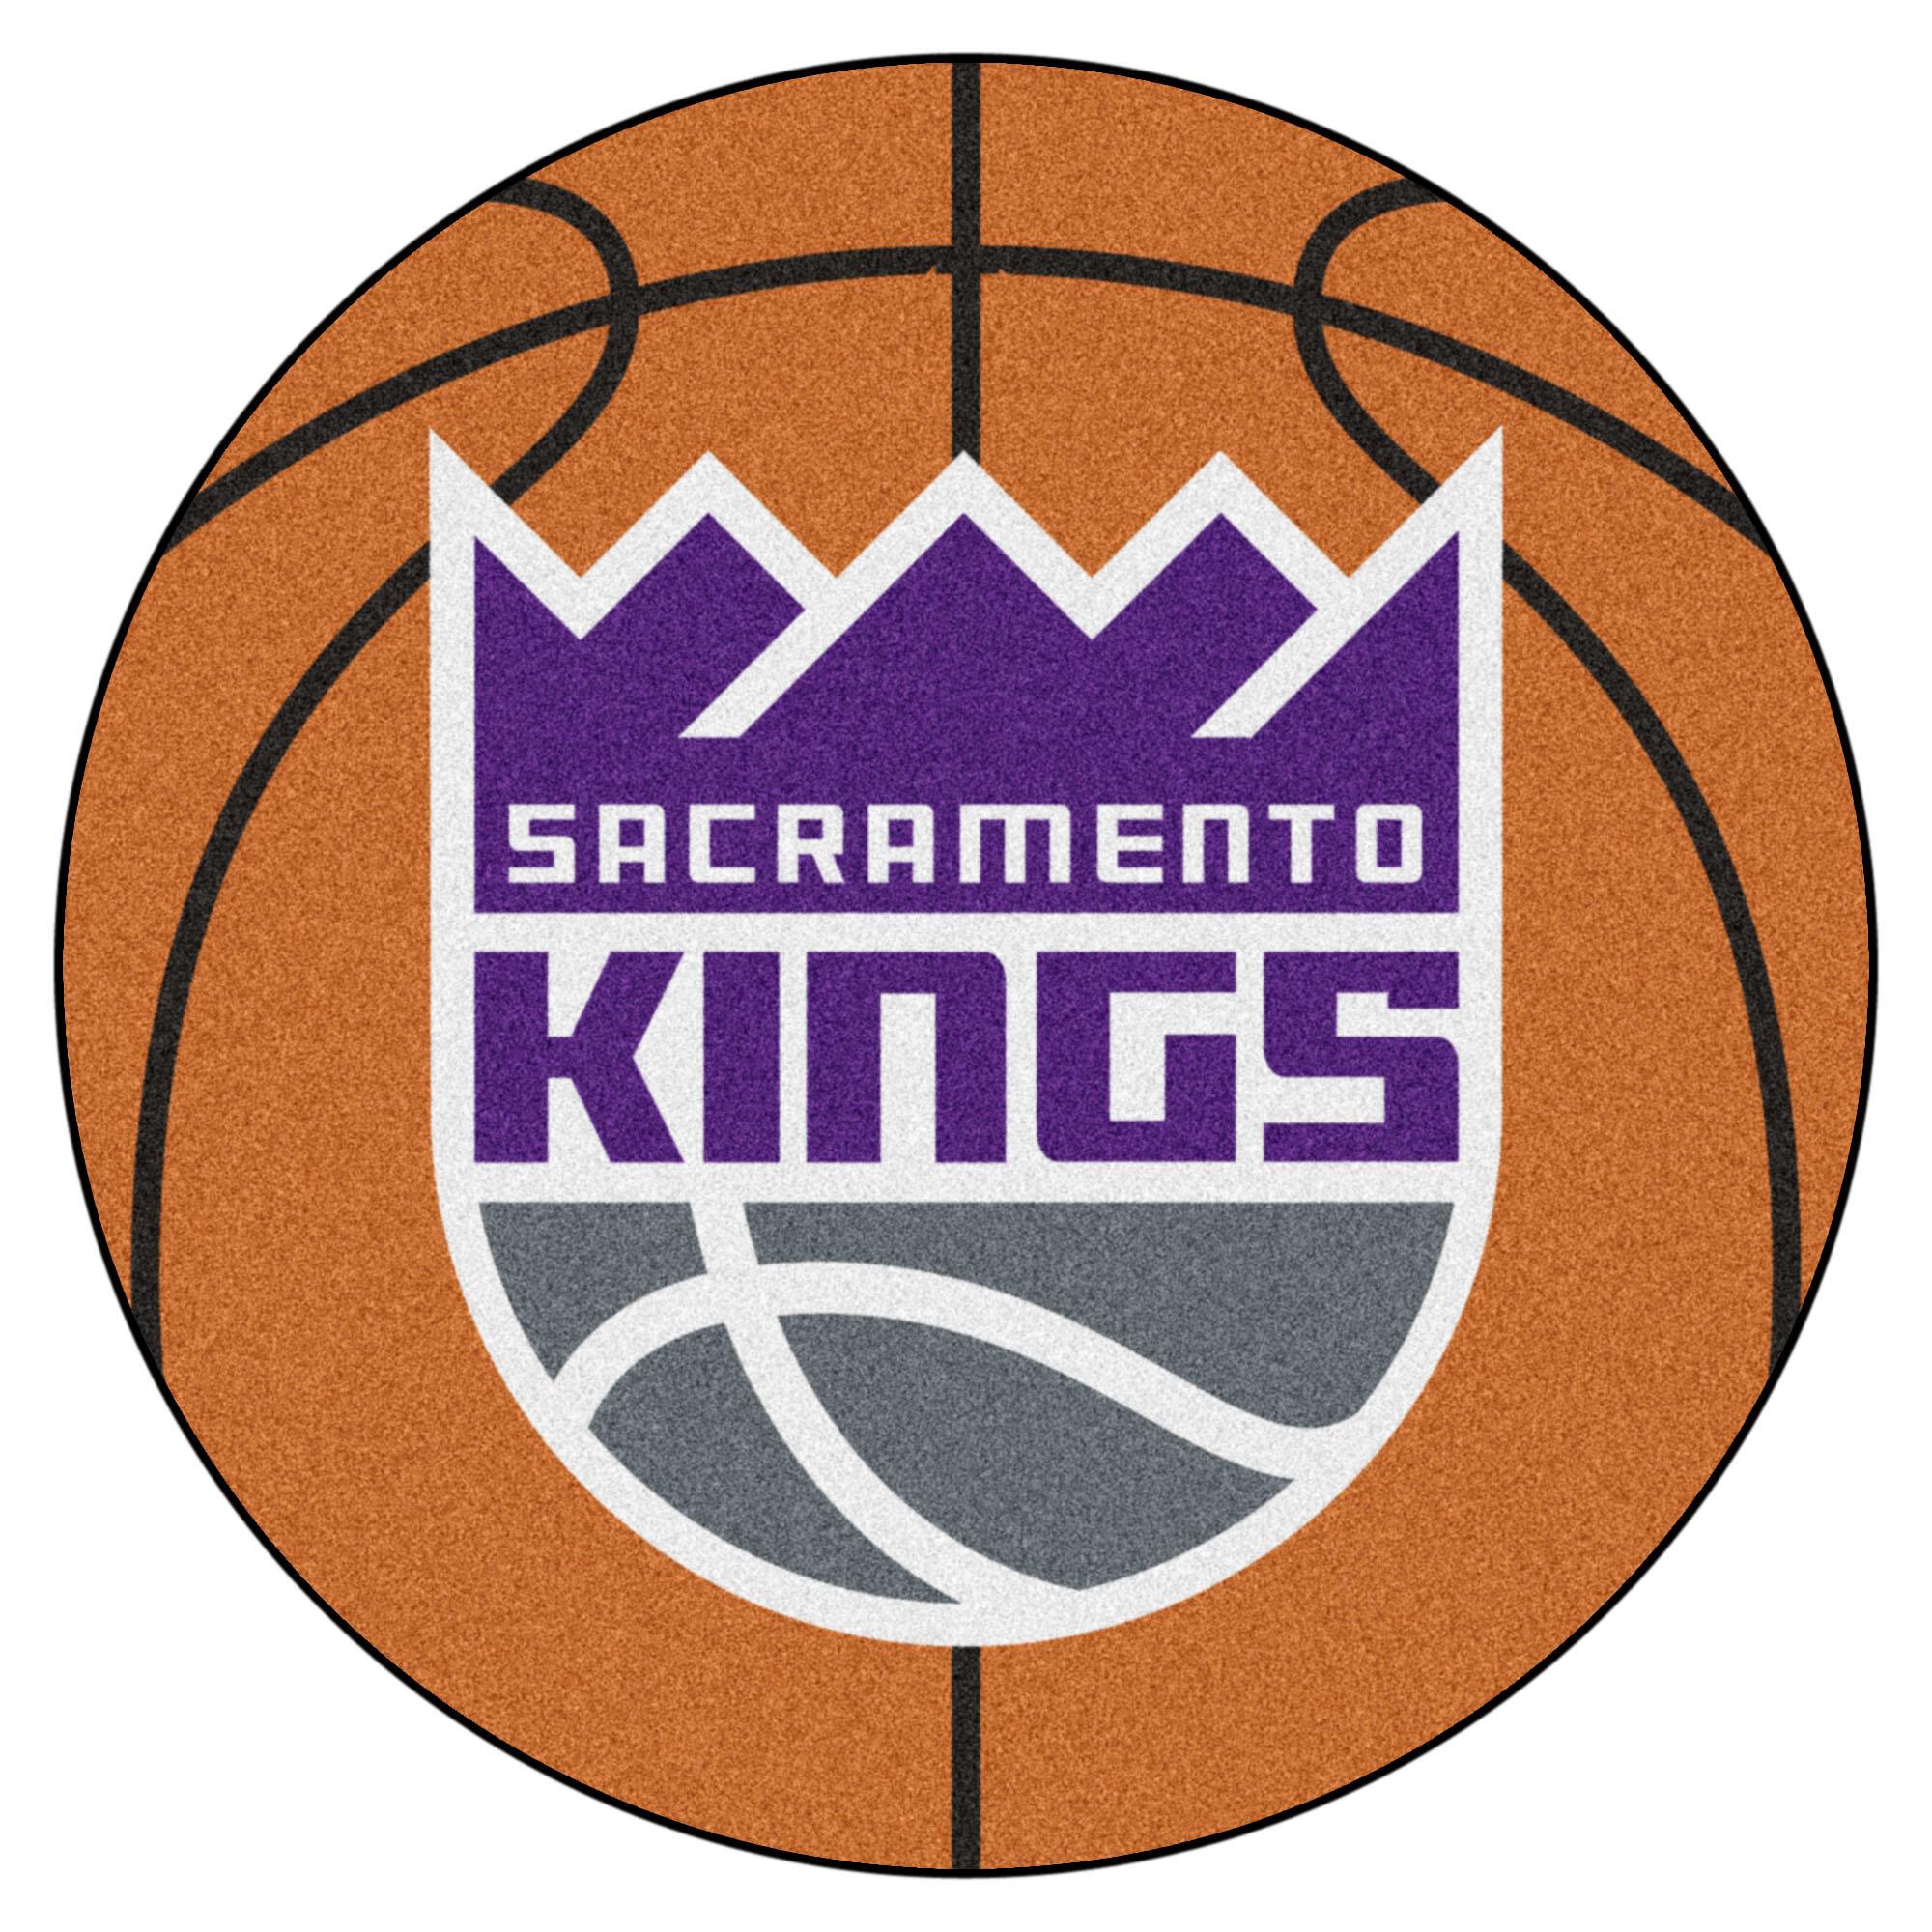 FANMATS NBA - Sacramento Kings Basketball Doormat